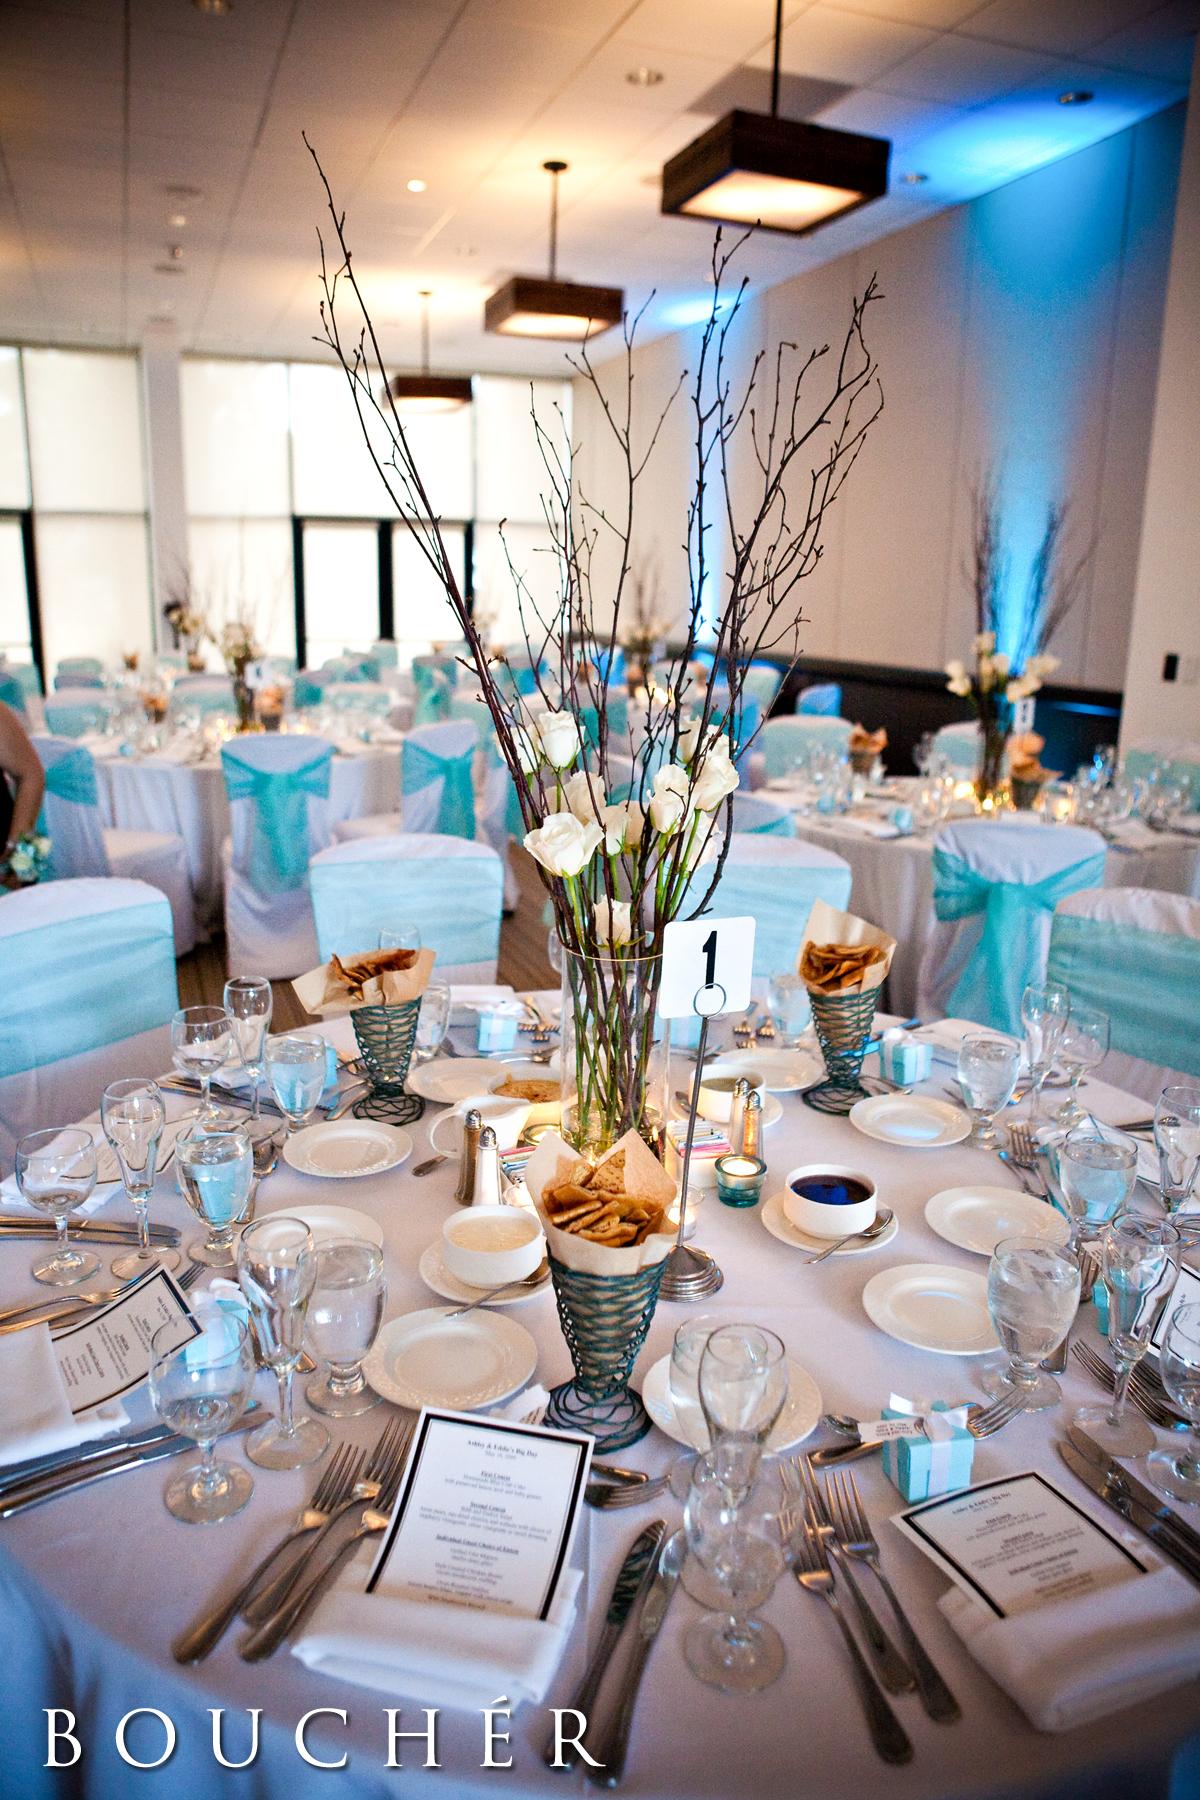 Reception, Flowers & Decor, Lighting, Up, Sound prodigy, Decore